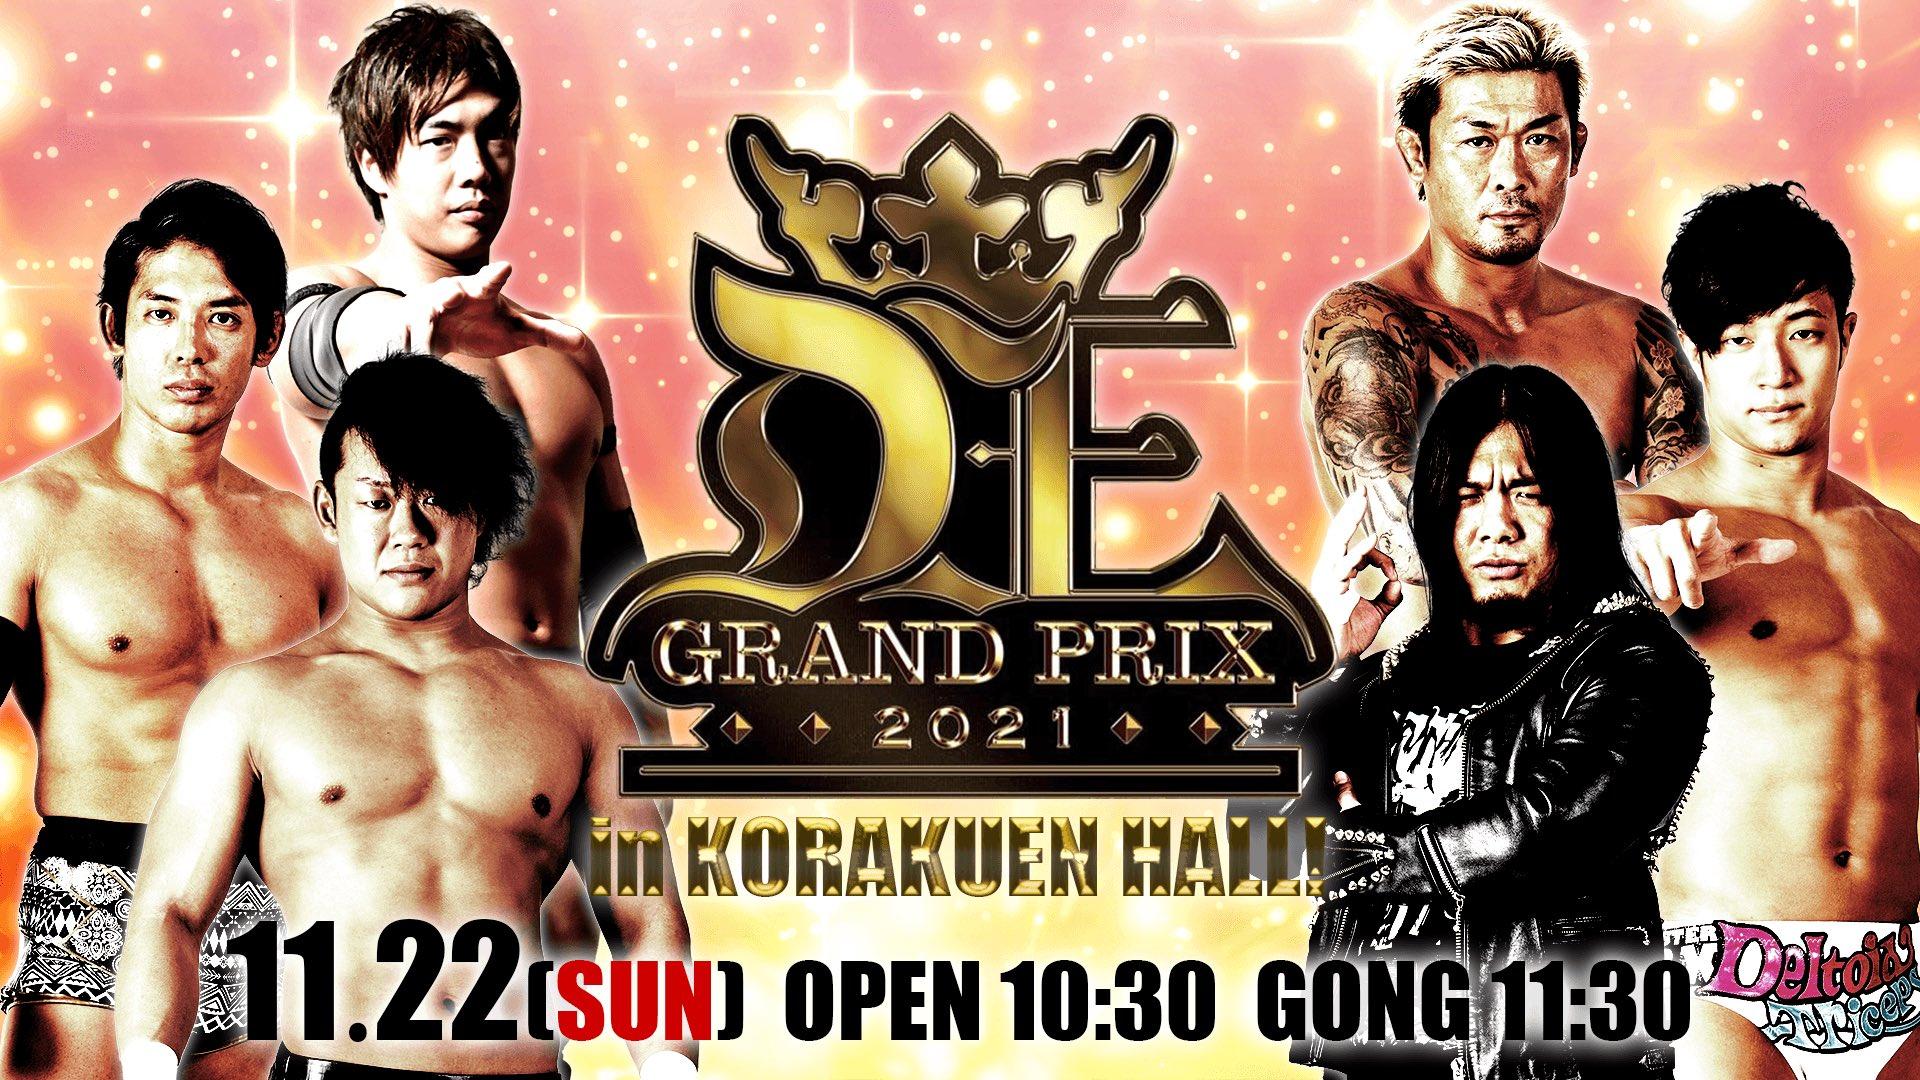 DDT D-Ou Grand Prix 2021 In Korakuen Hall